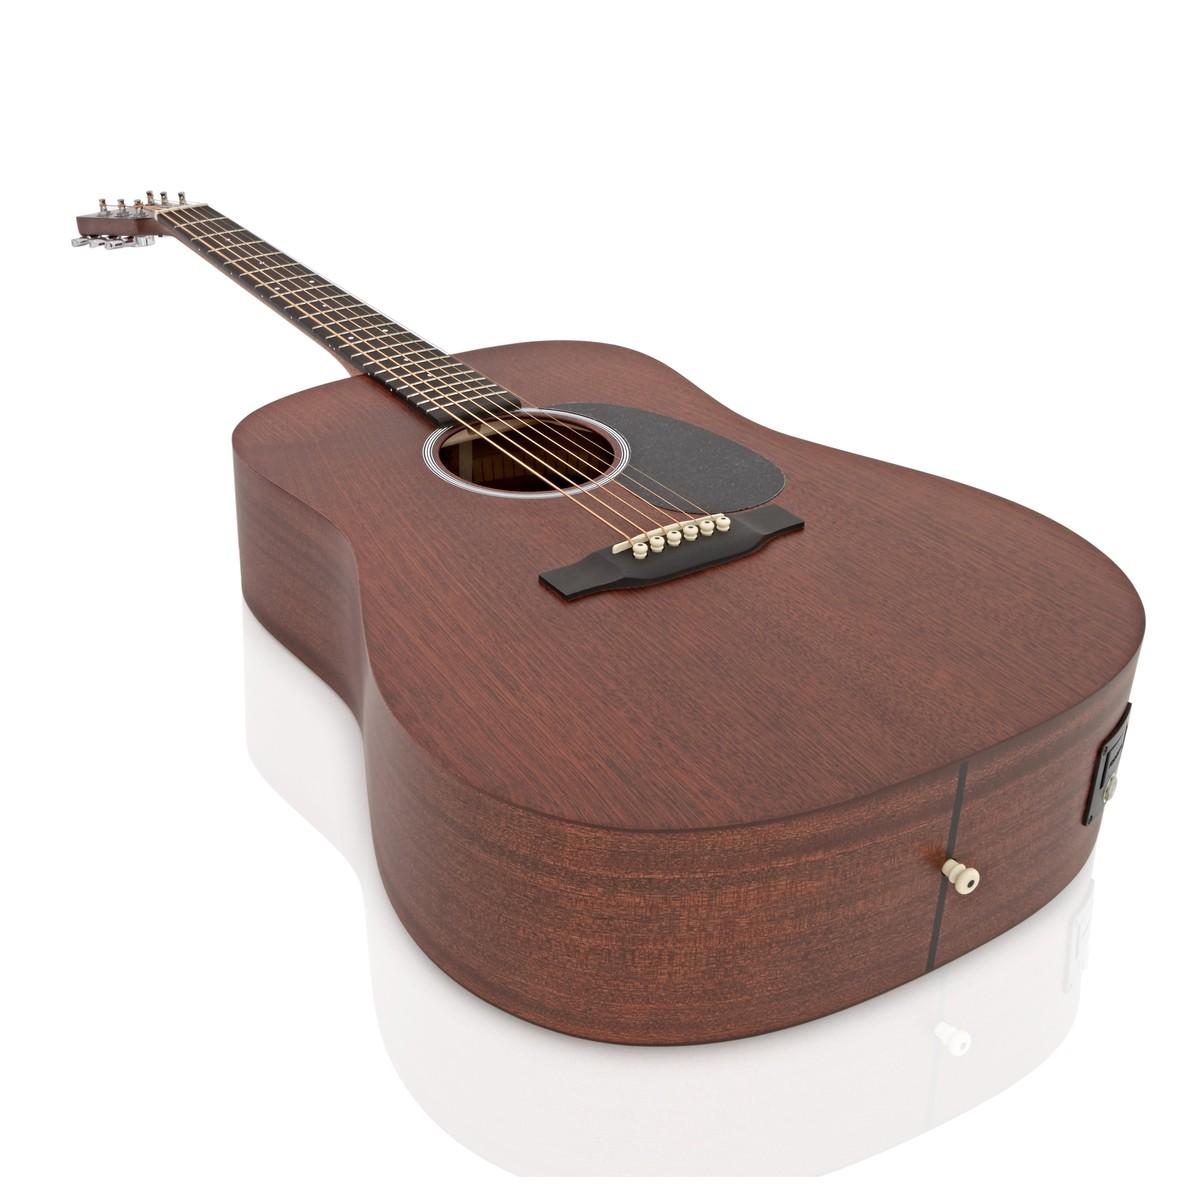 martin drs 1 guitare electro acoustique. Black Bedroom Furniture Sets. Home Design Ideas